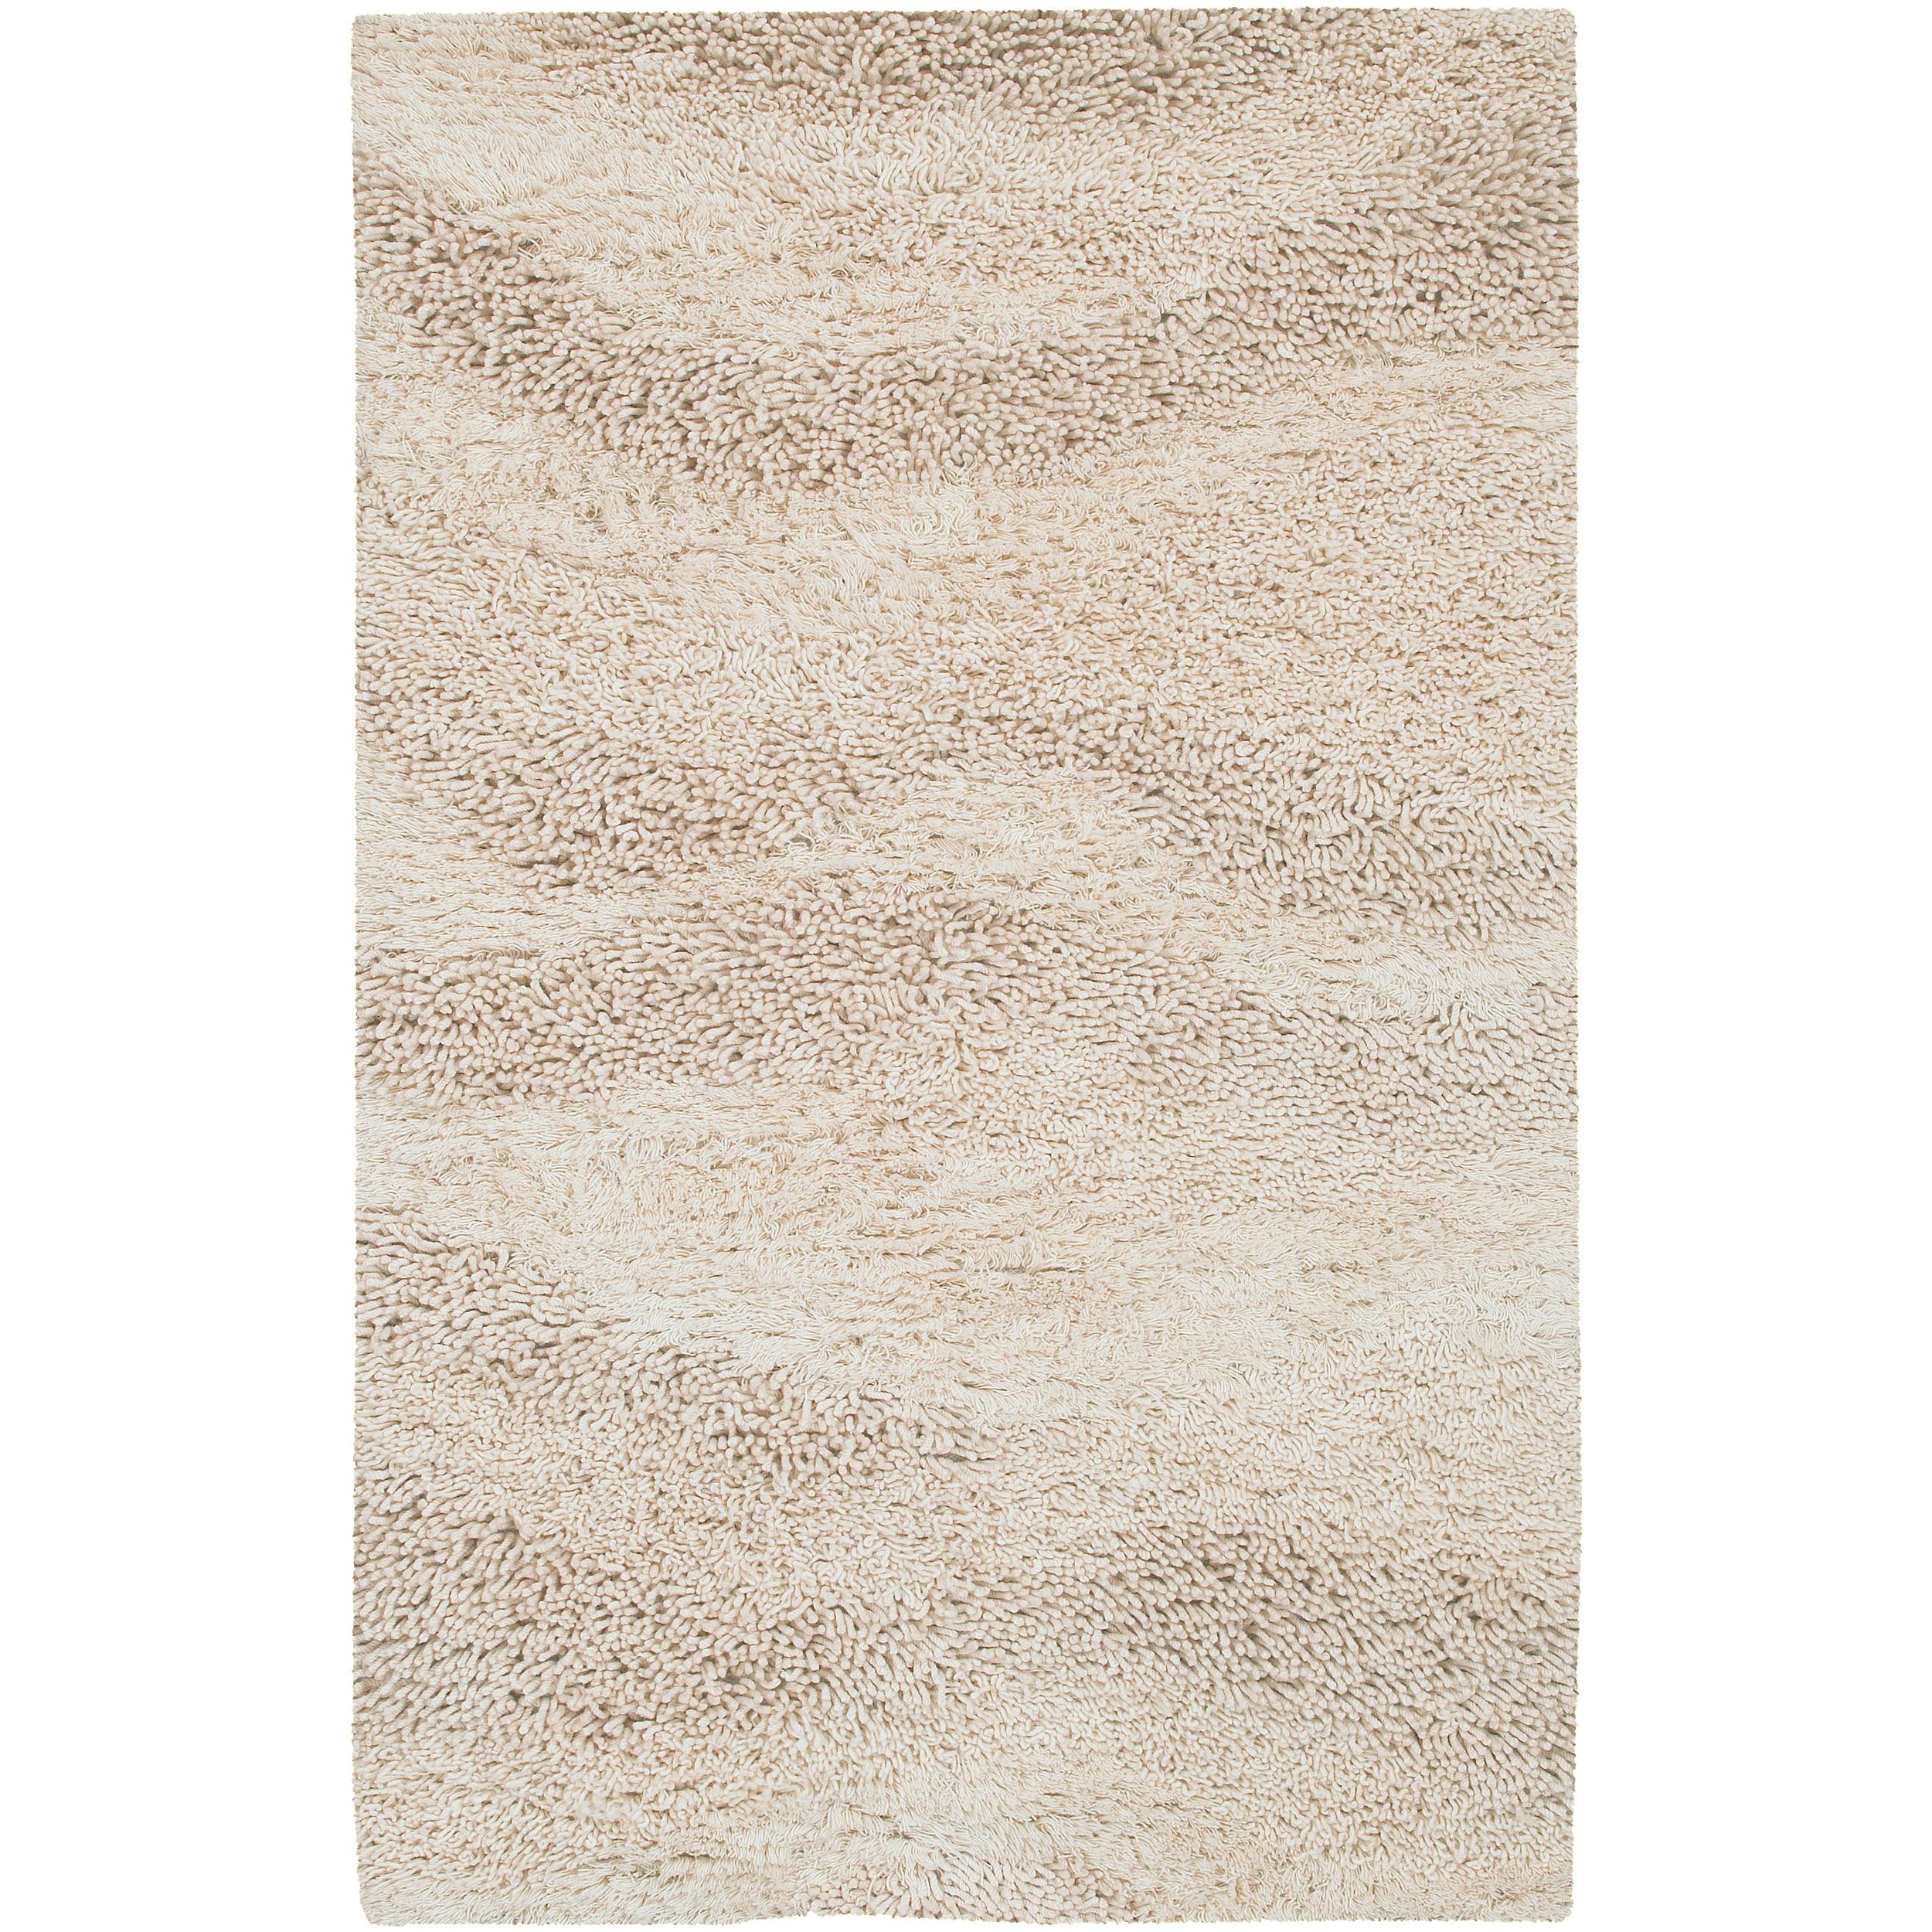 Hand-woven Lakes Ivory Wool Plush Shag Rug (2' x 3')